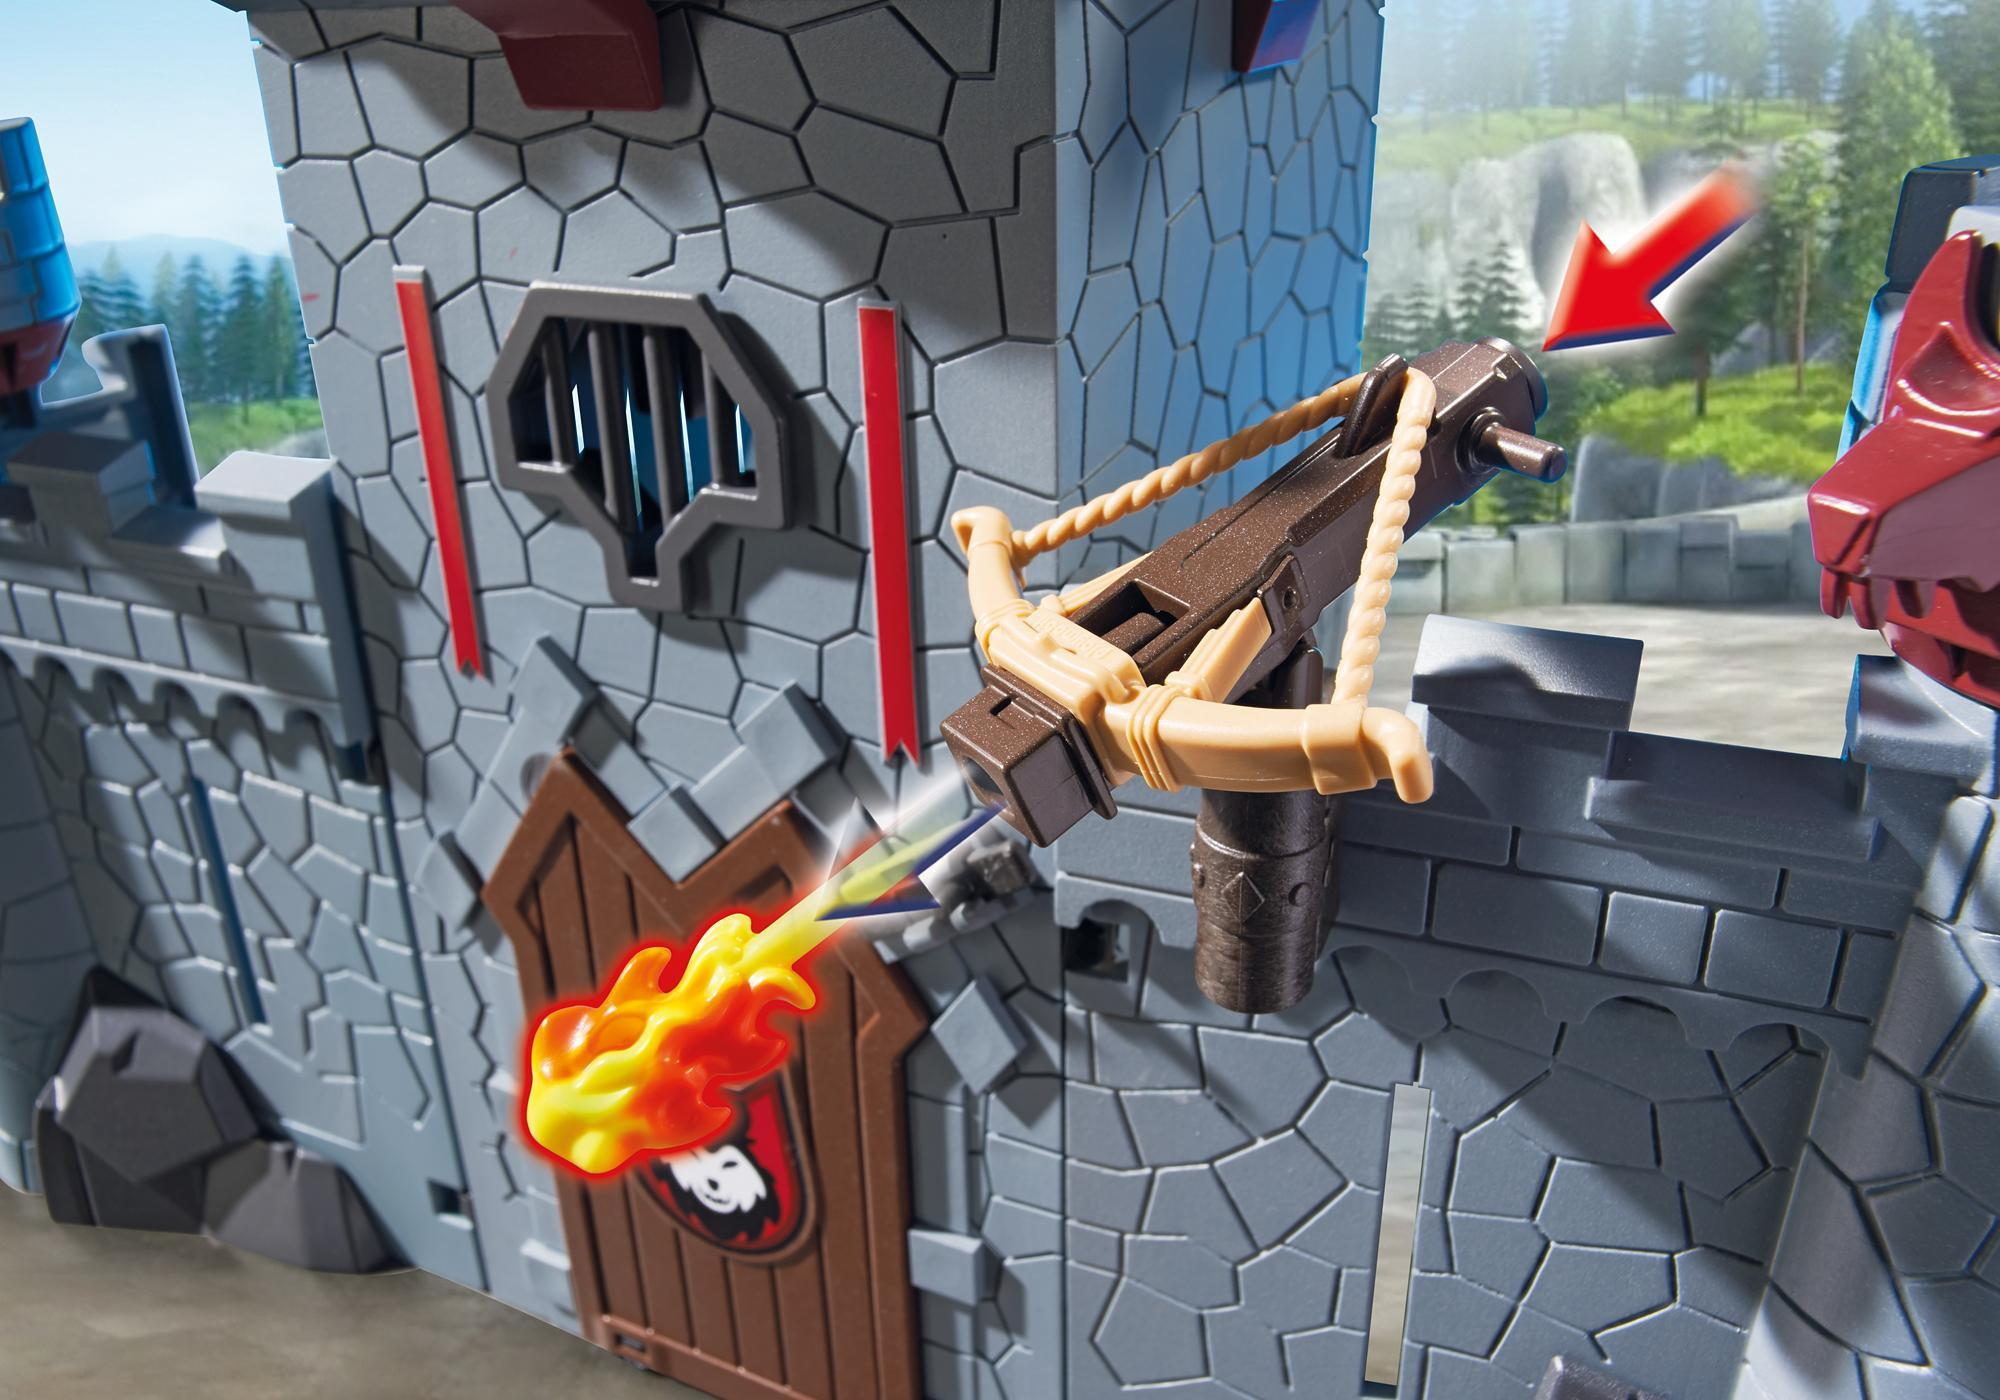 http://media.playmobil.com/i/playmobil/6697_product_extra2